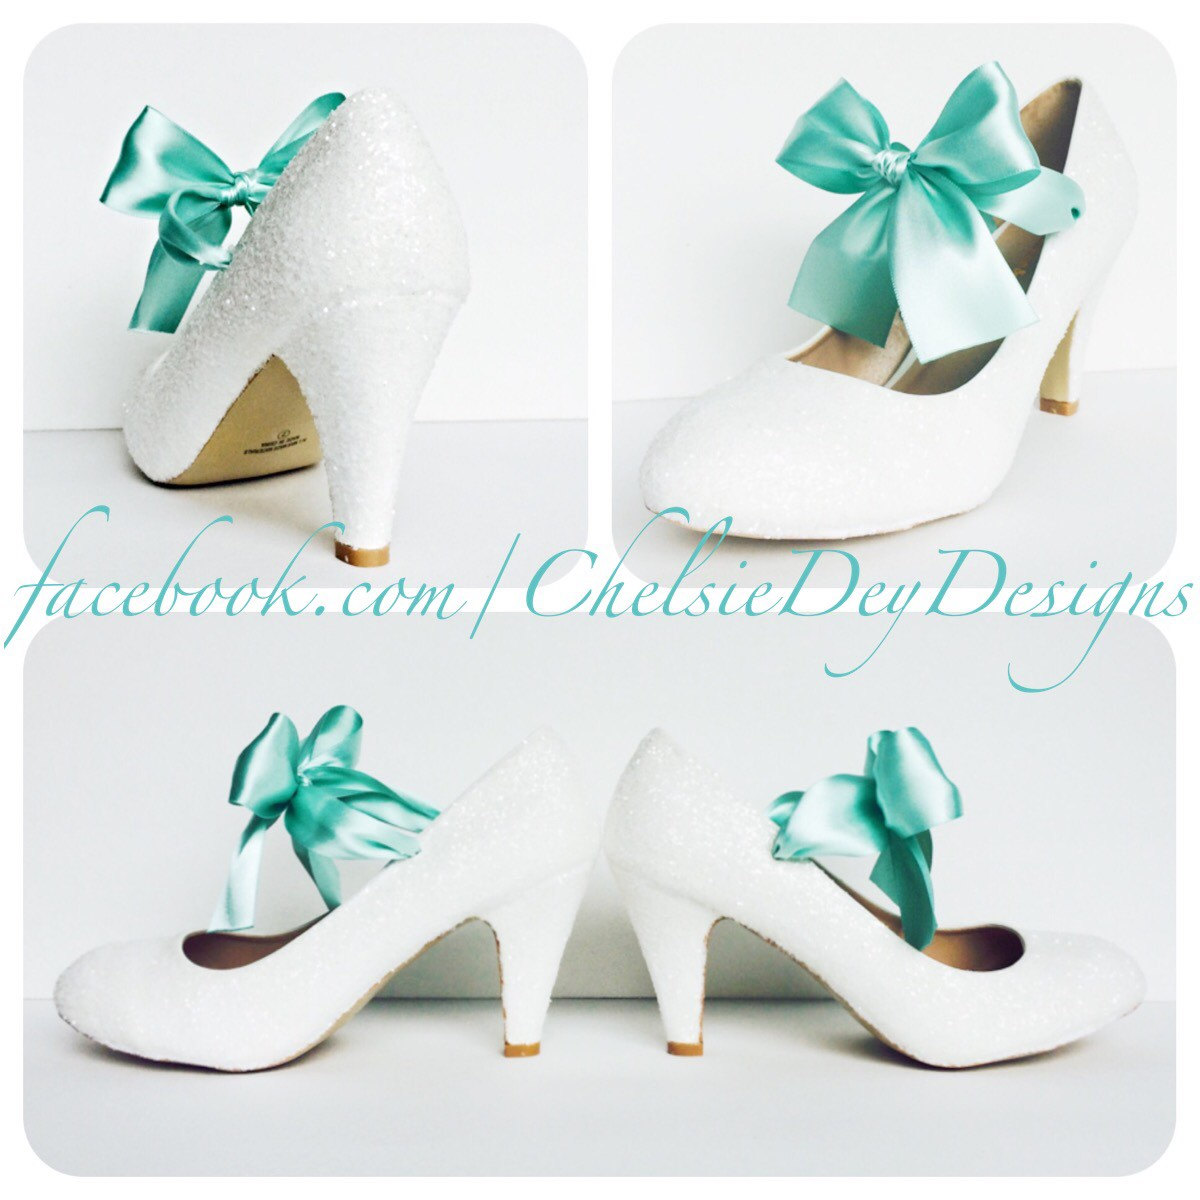 7717a1e886 Mint Glitter Low Heels, White Aqua Seafoam Pumps, Low Wedding Shoes ...